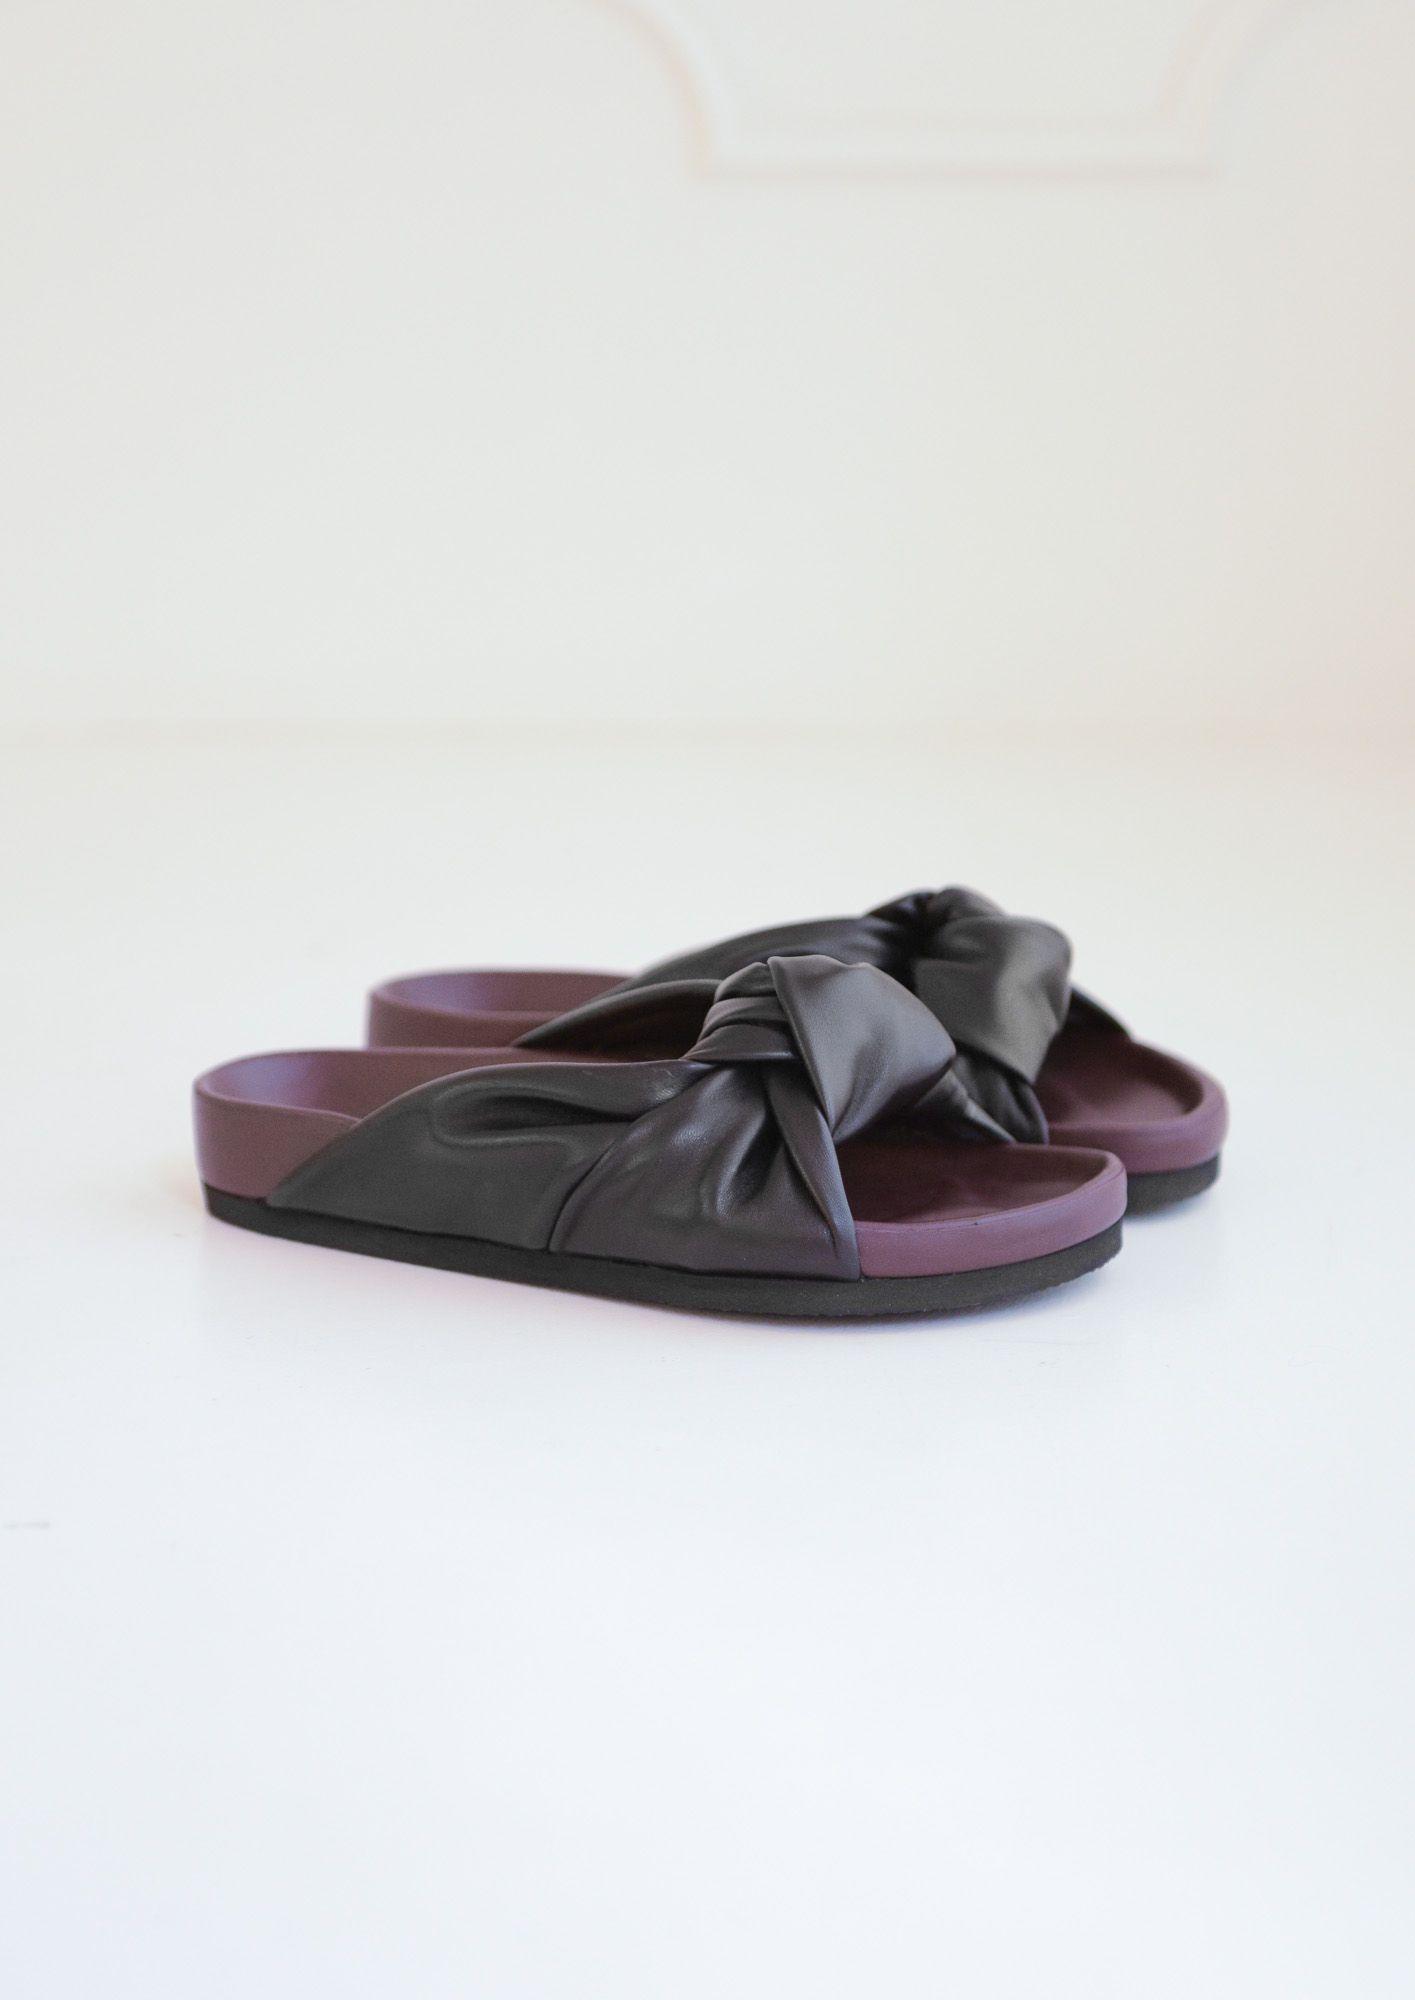 b2f15b64864 Celine leather knot sandals